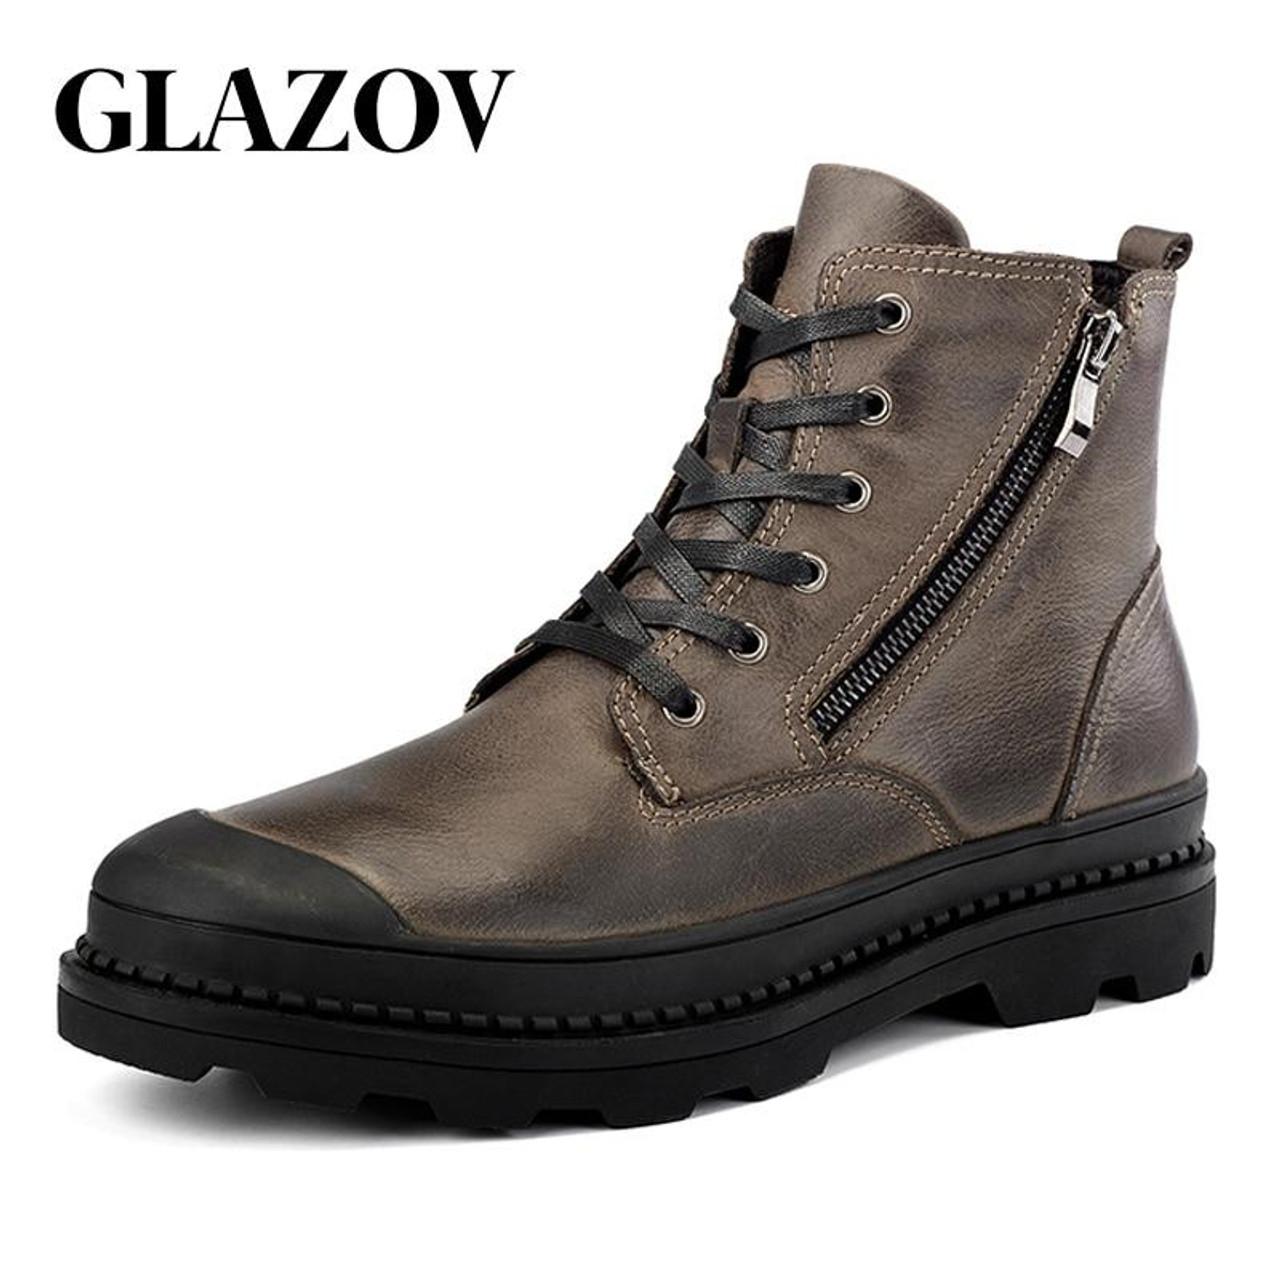 GLAZOV High Quality Genuine leather